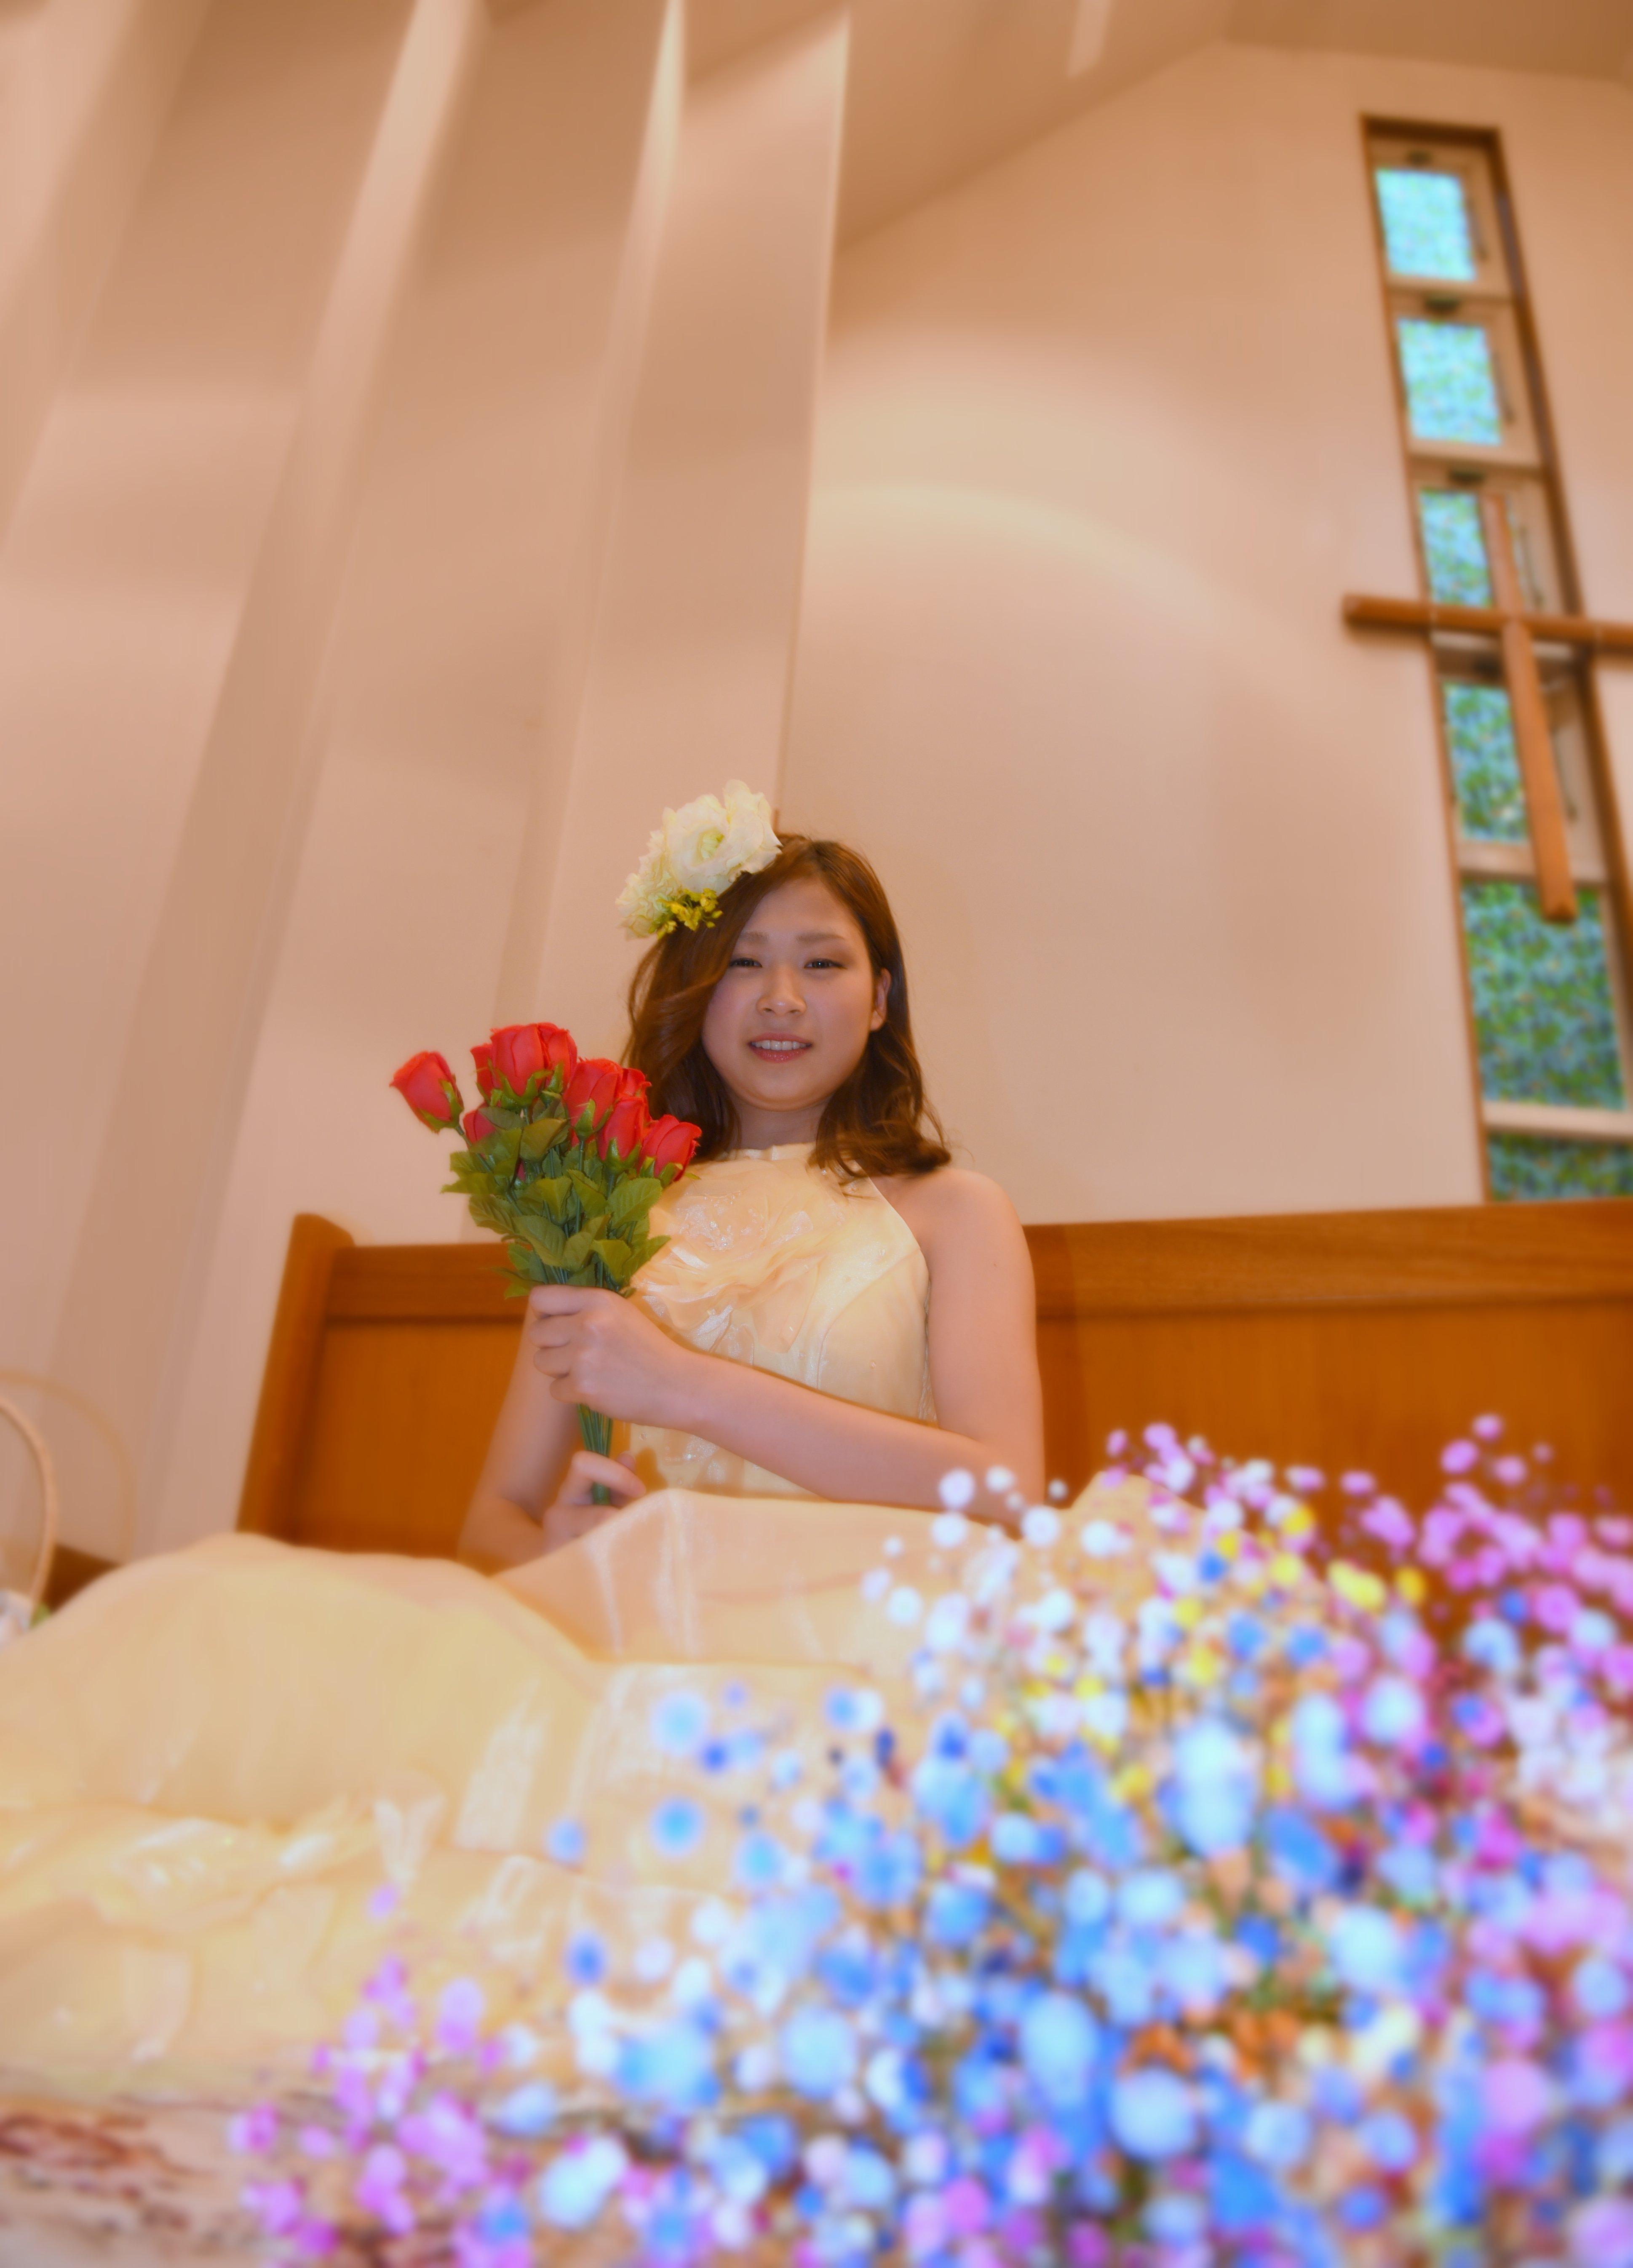 Tomoka Hirotaki 広滝友香